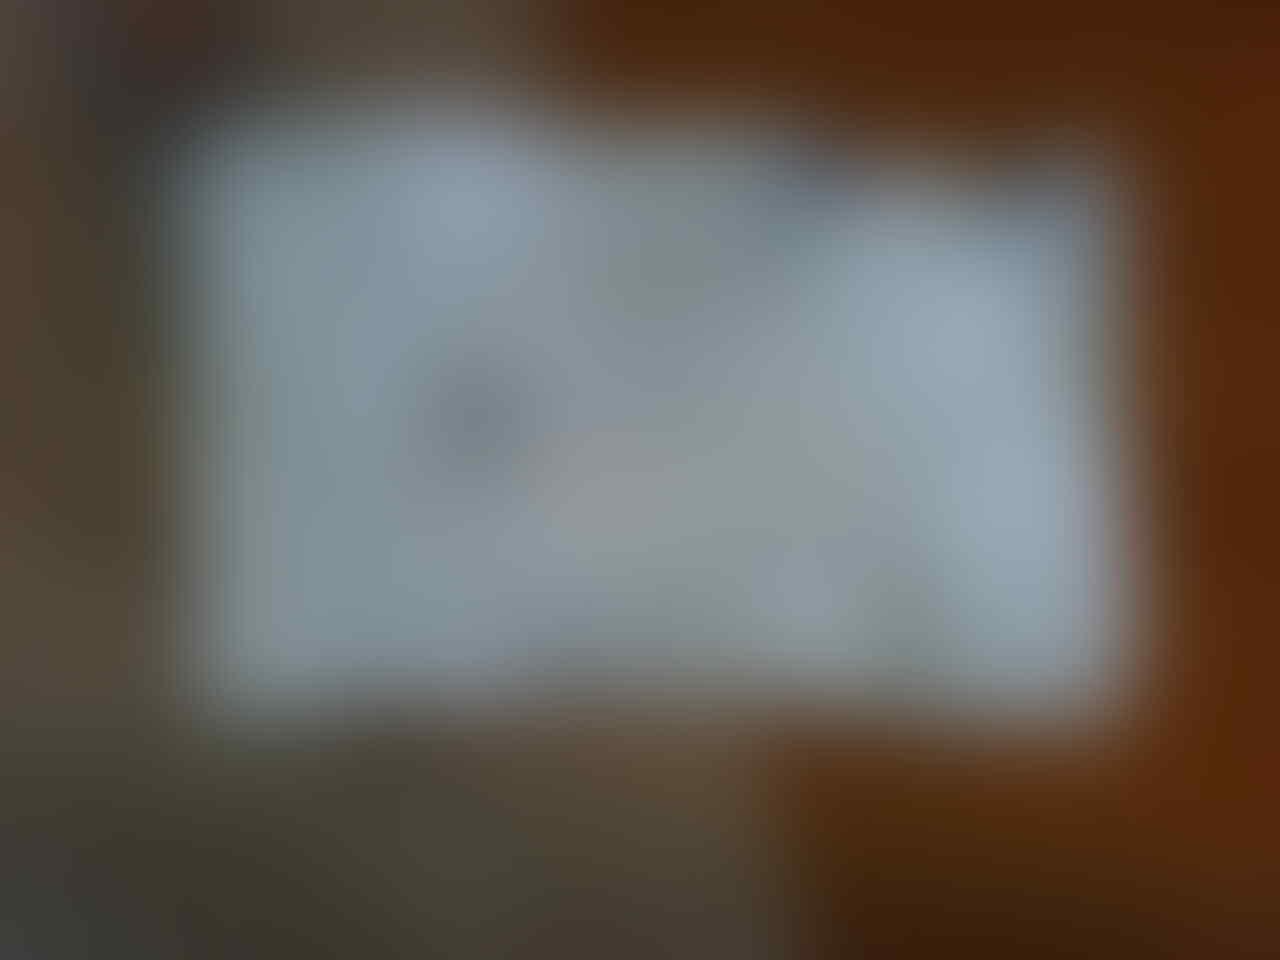 Jual Perdana XL HotRoad Gratis Internet 3 Bulan Kuota 3,6 GB Murah Bonus Cendol :)